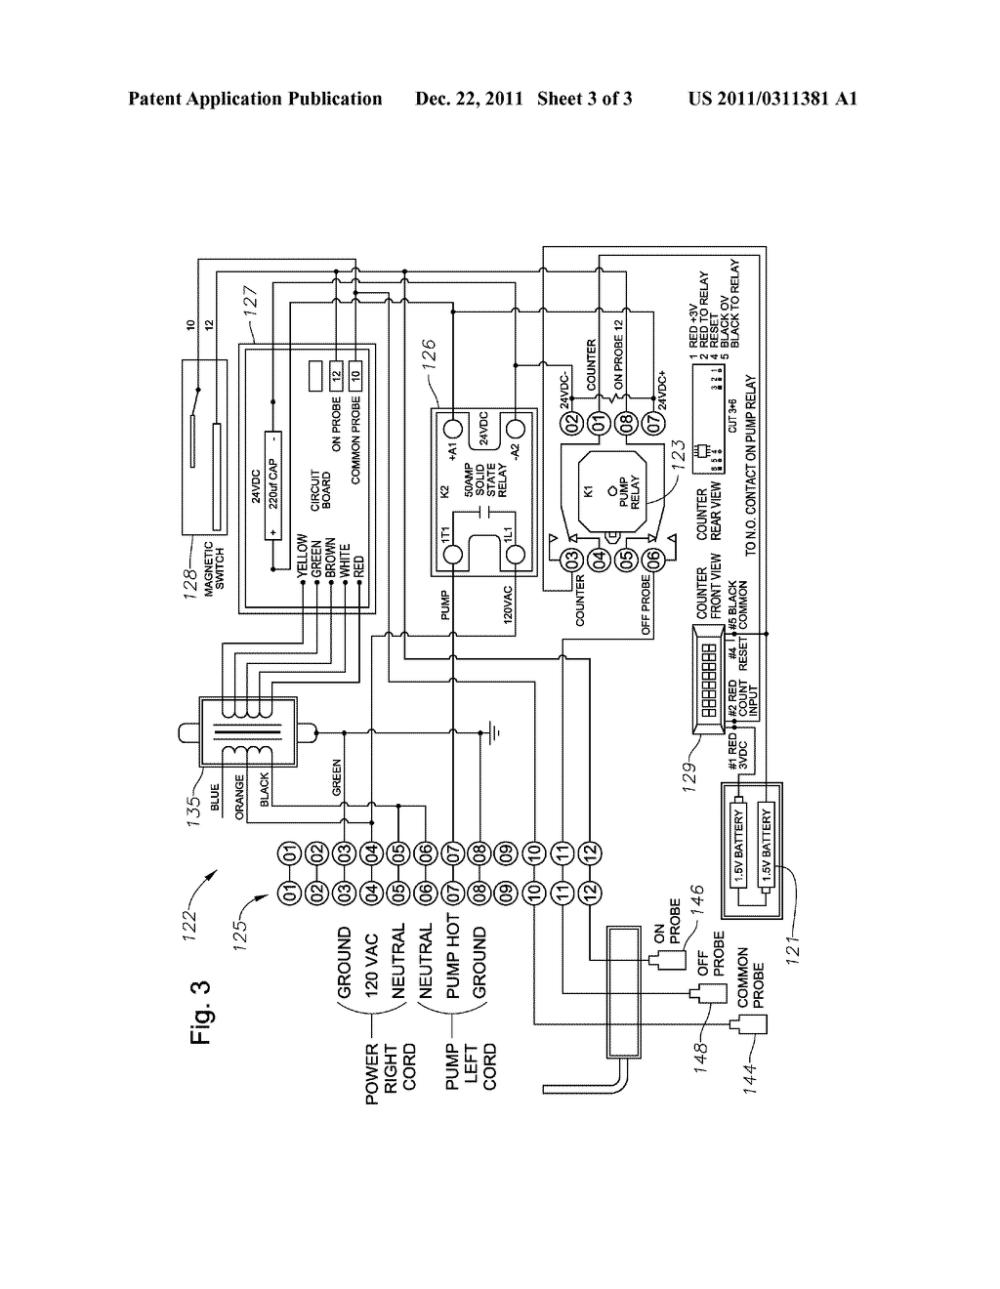 medium resolution of solid state sump pump control diagram schematic and image 04 rh patentsencyclopedia com radon and sump pump duplex sump pump detail